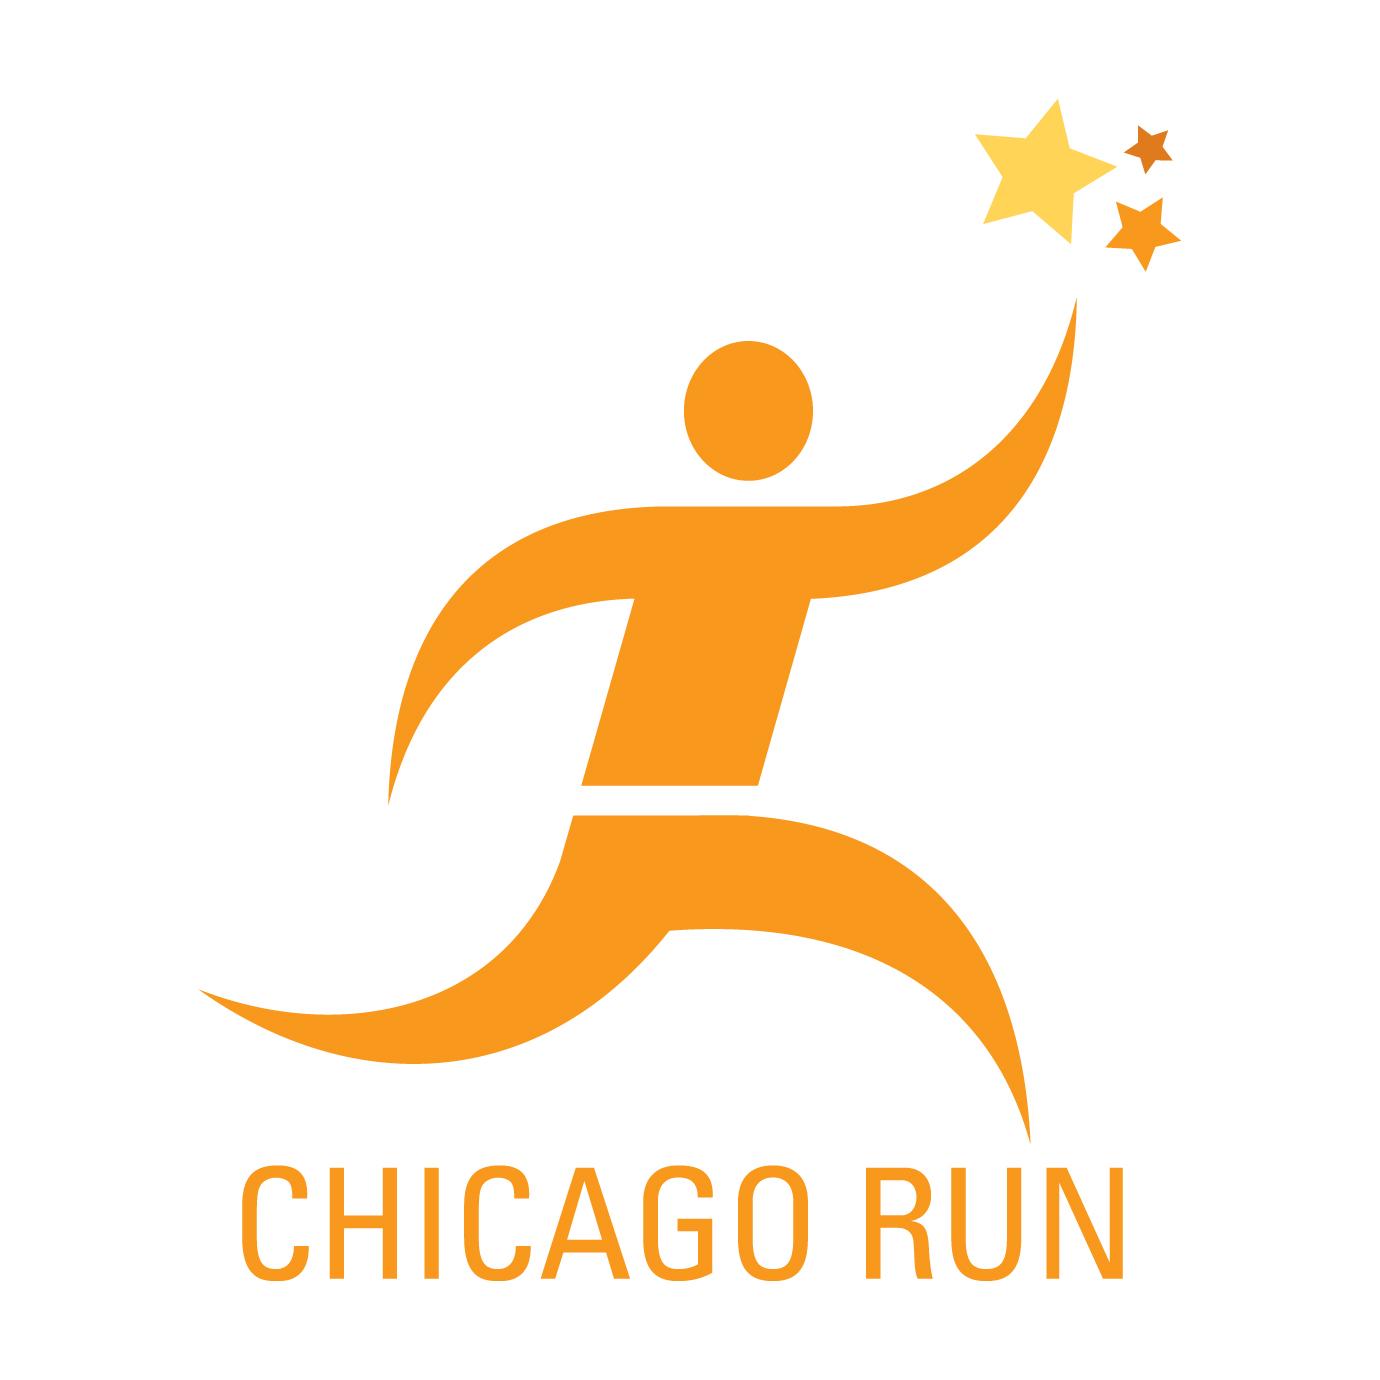 Chicago Run.jpg